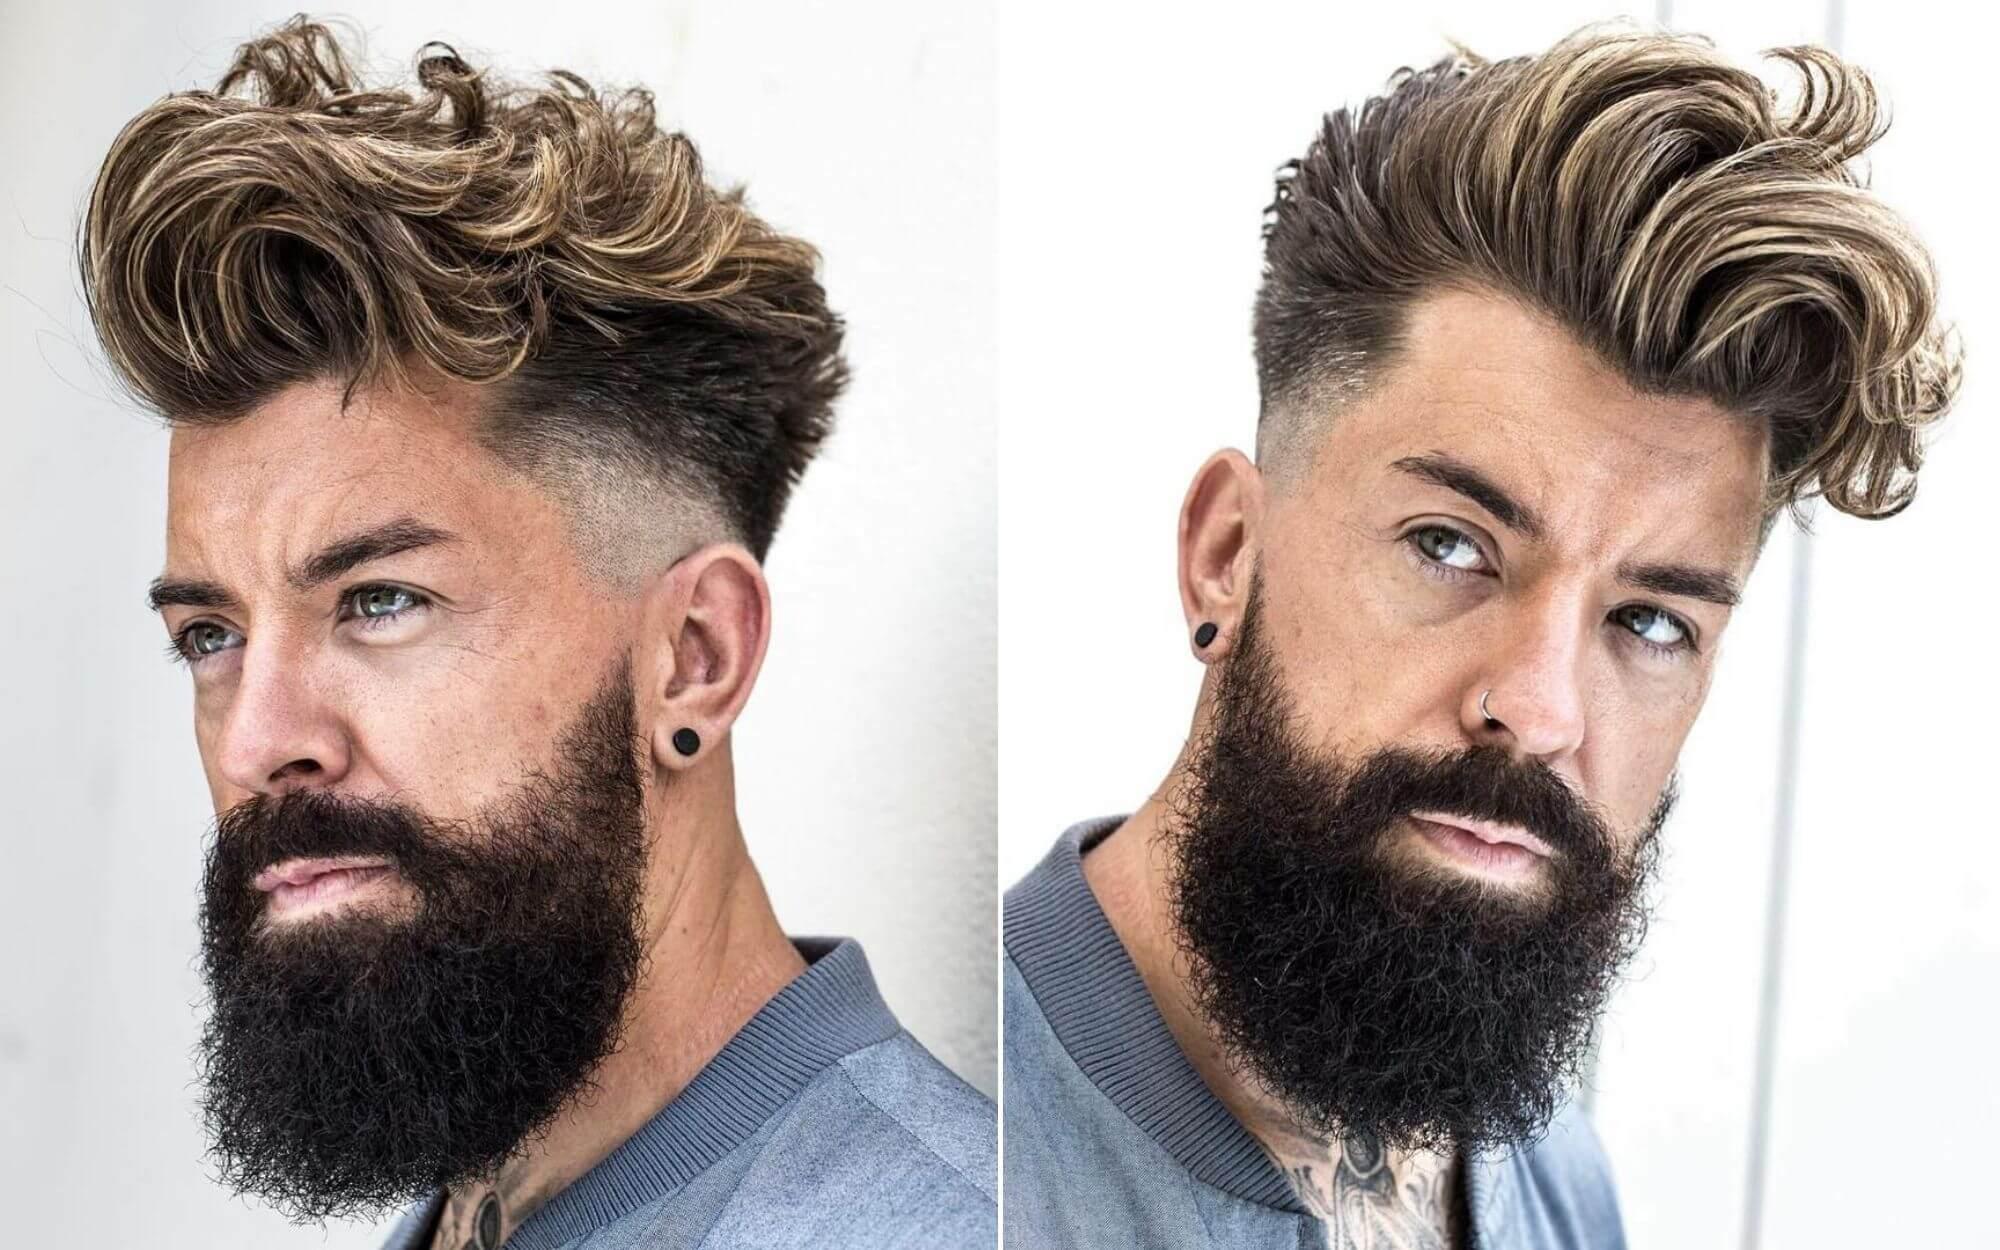 Long Wavy Hair with Undercut and Beard